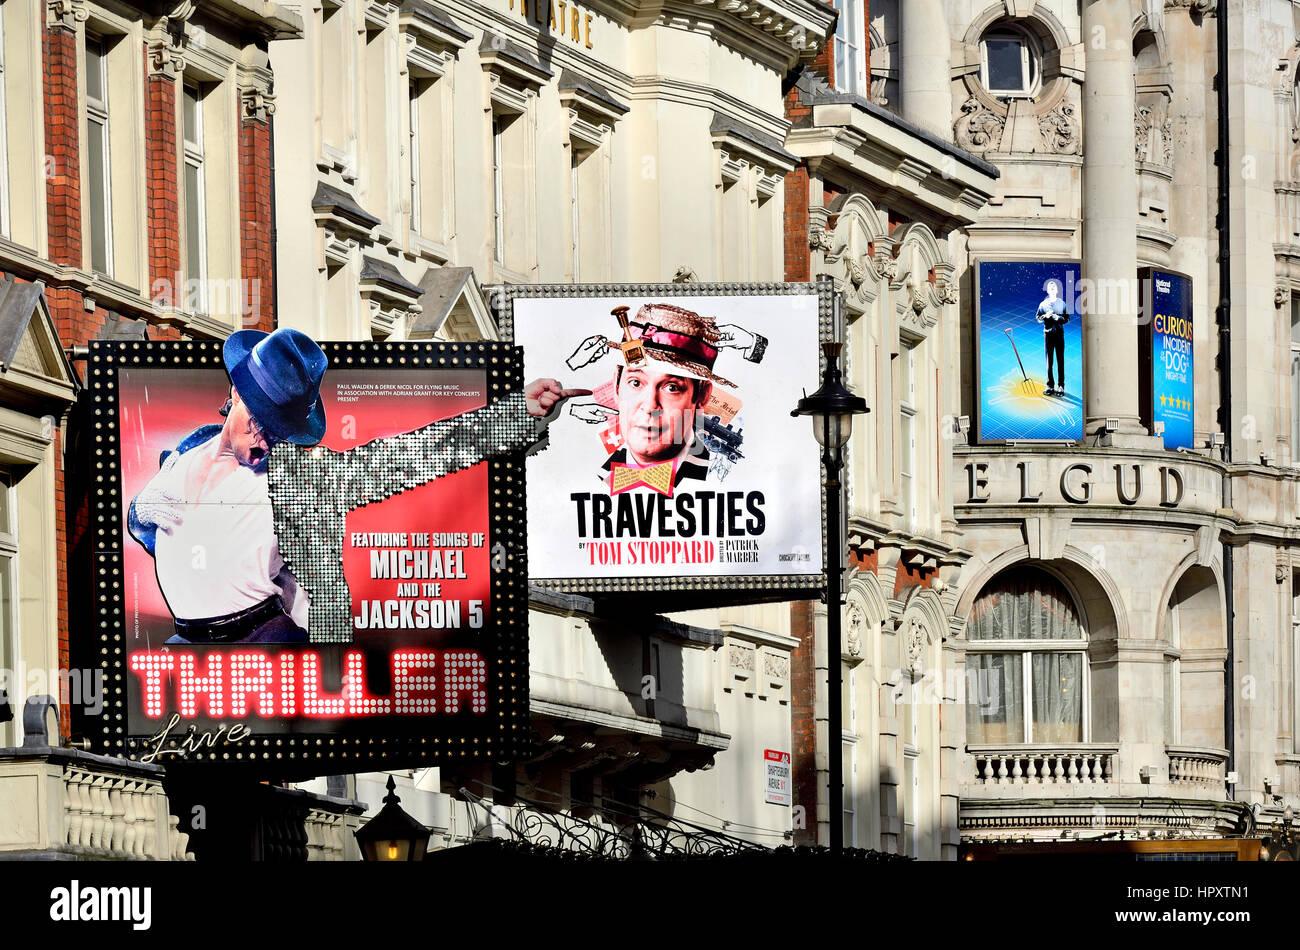 London, England, UK. Tom Stoppard's 'Travesties' at the Apollo Theatre, Shaftesbury Avenue, Feb 2017 - Stock Image